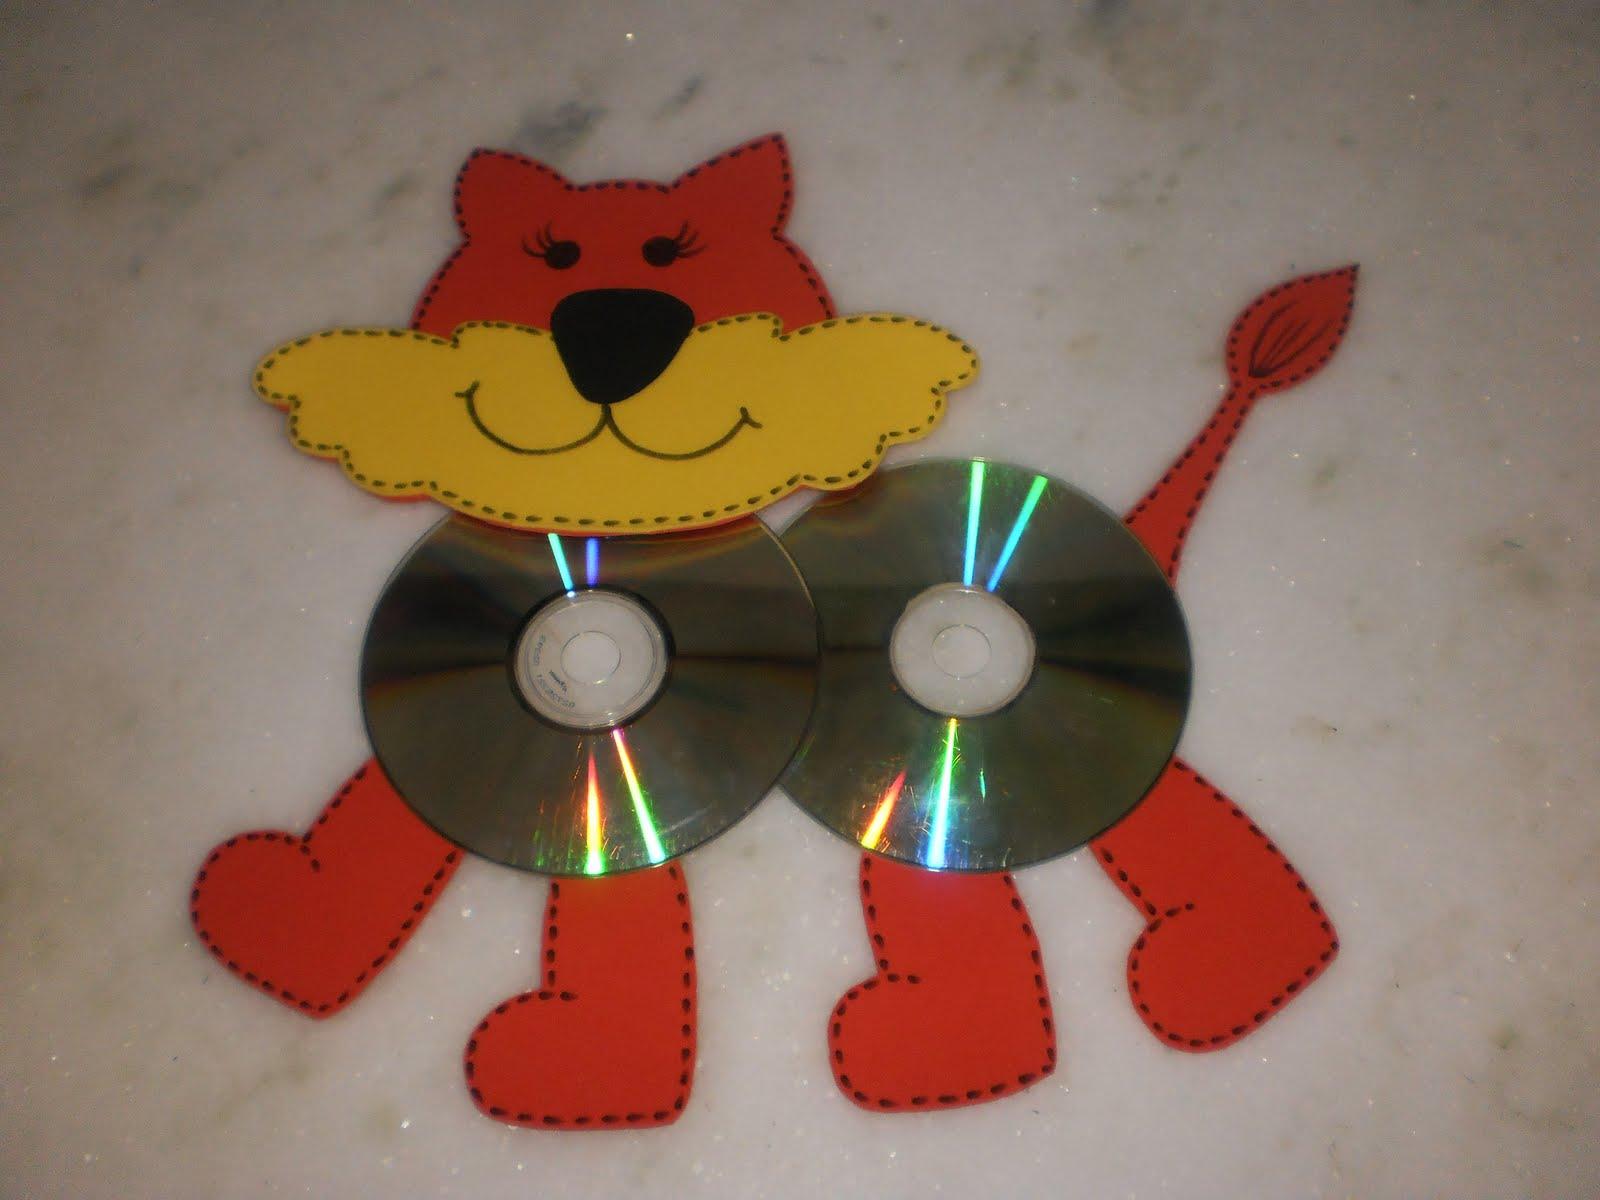 Peti itumbiara arte com cd usado - Manualidades con cd usados ...